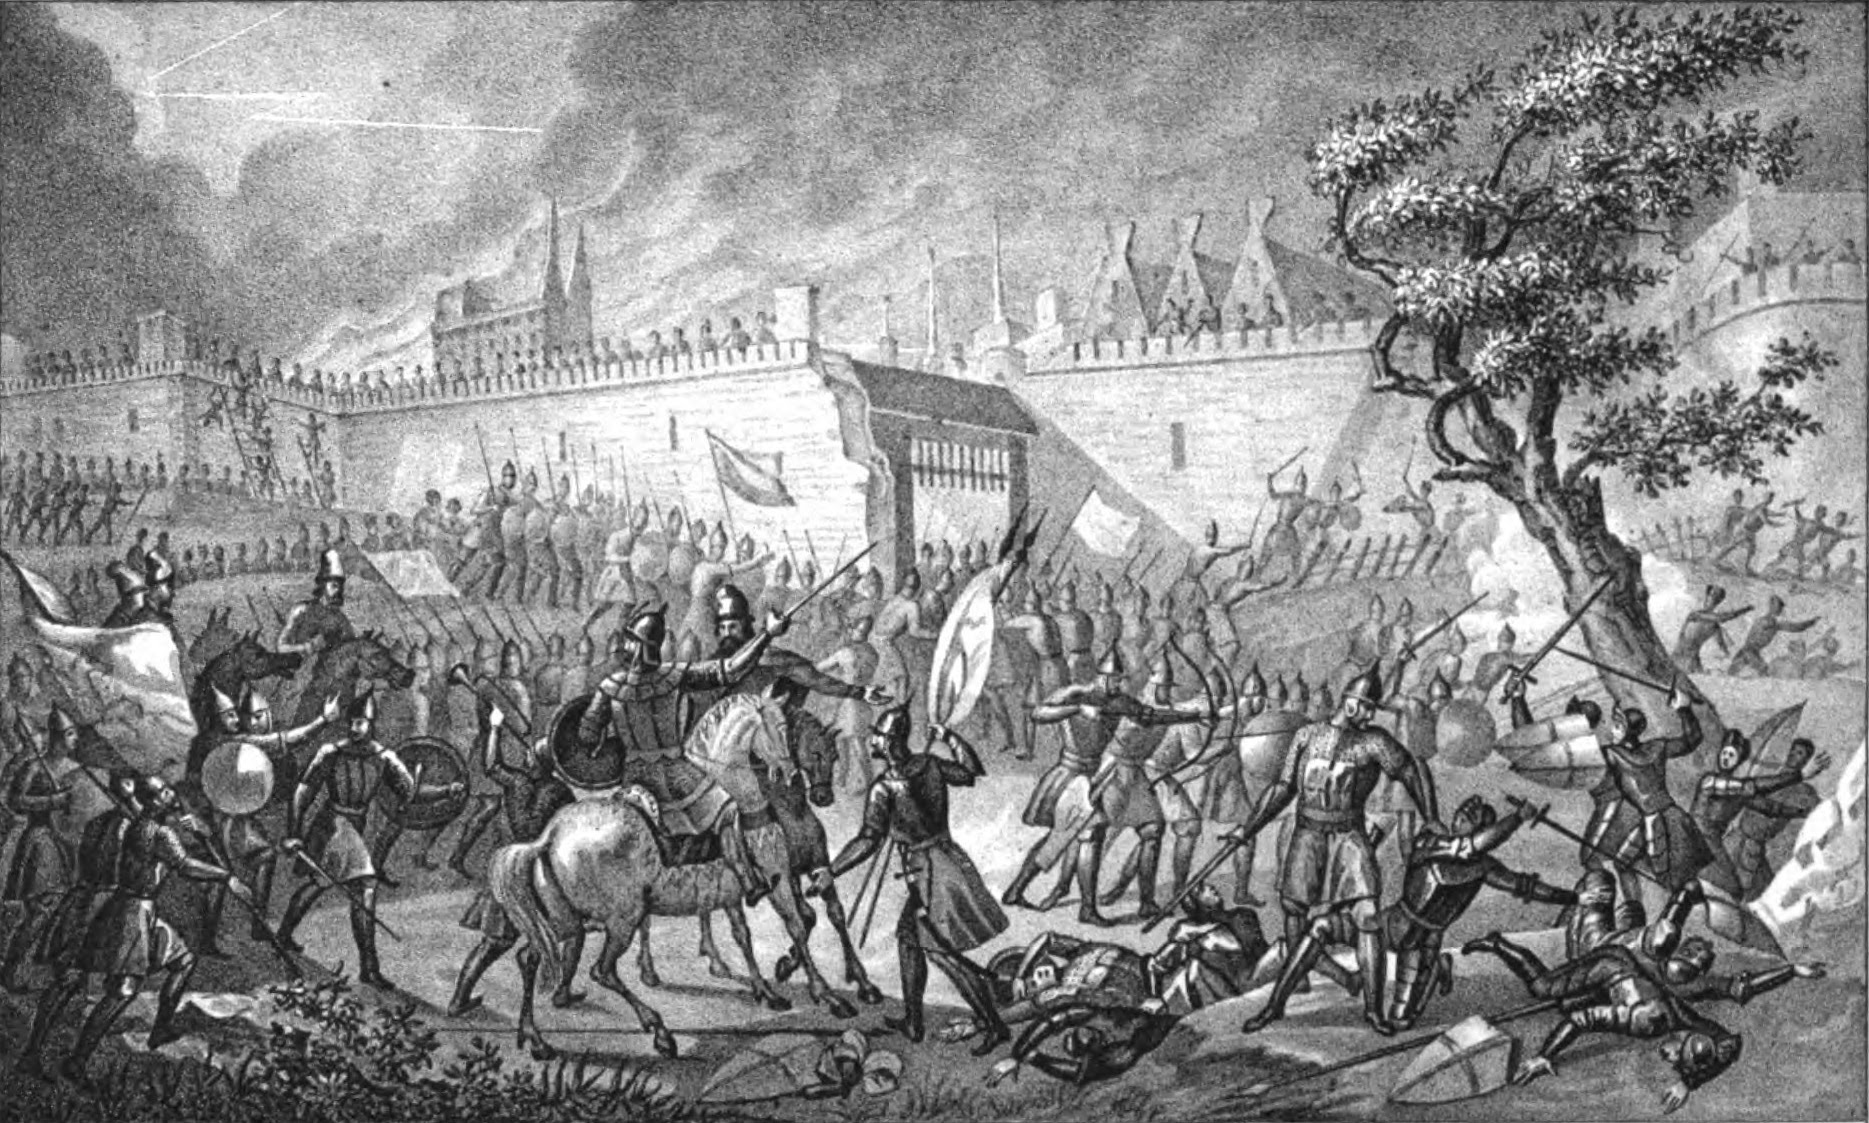 http://upload.wikimedia.org/wikipedia/commons/c/c8/Siege_of_Narva_1558.jpg?uselang=ru